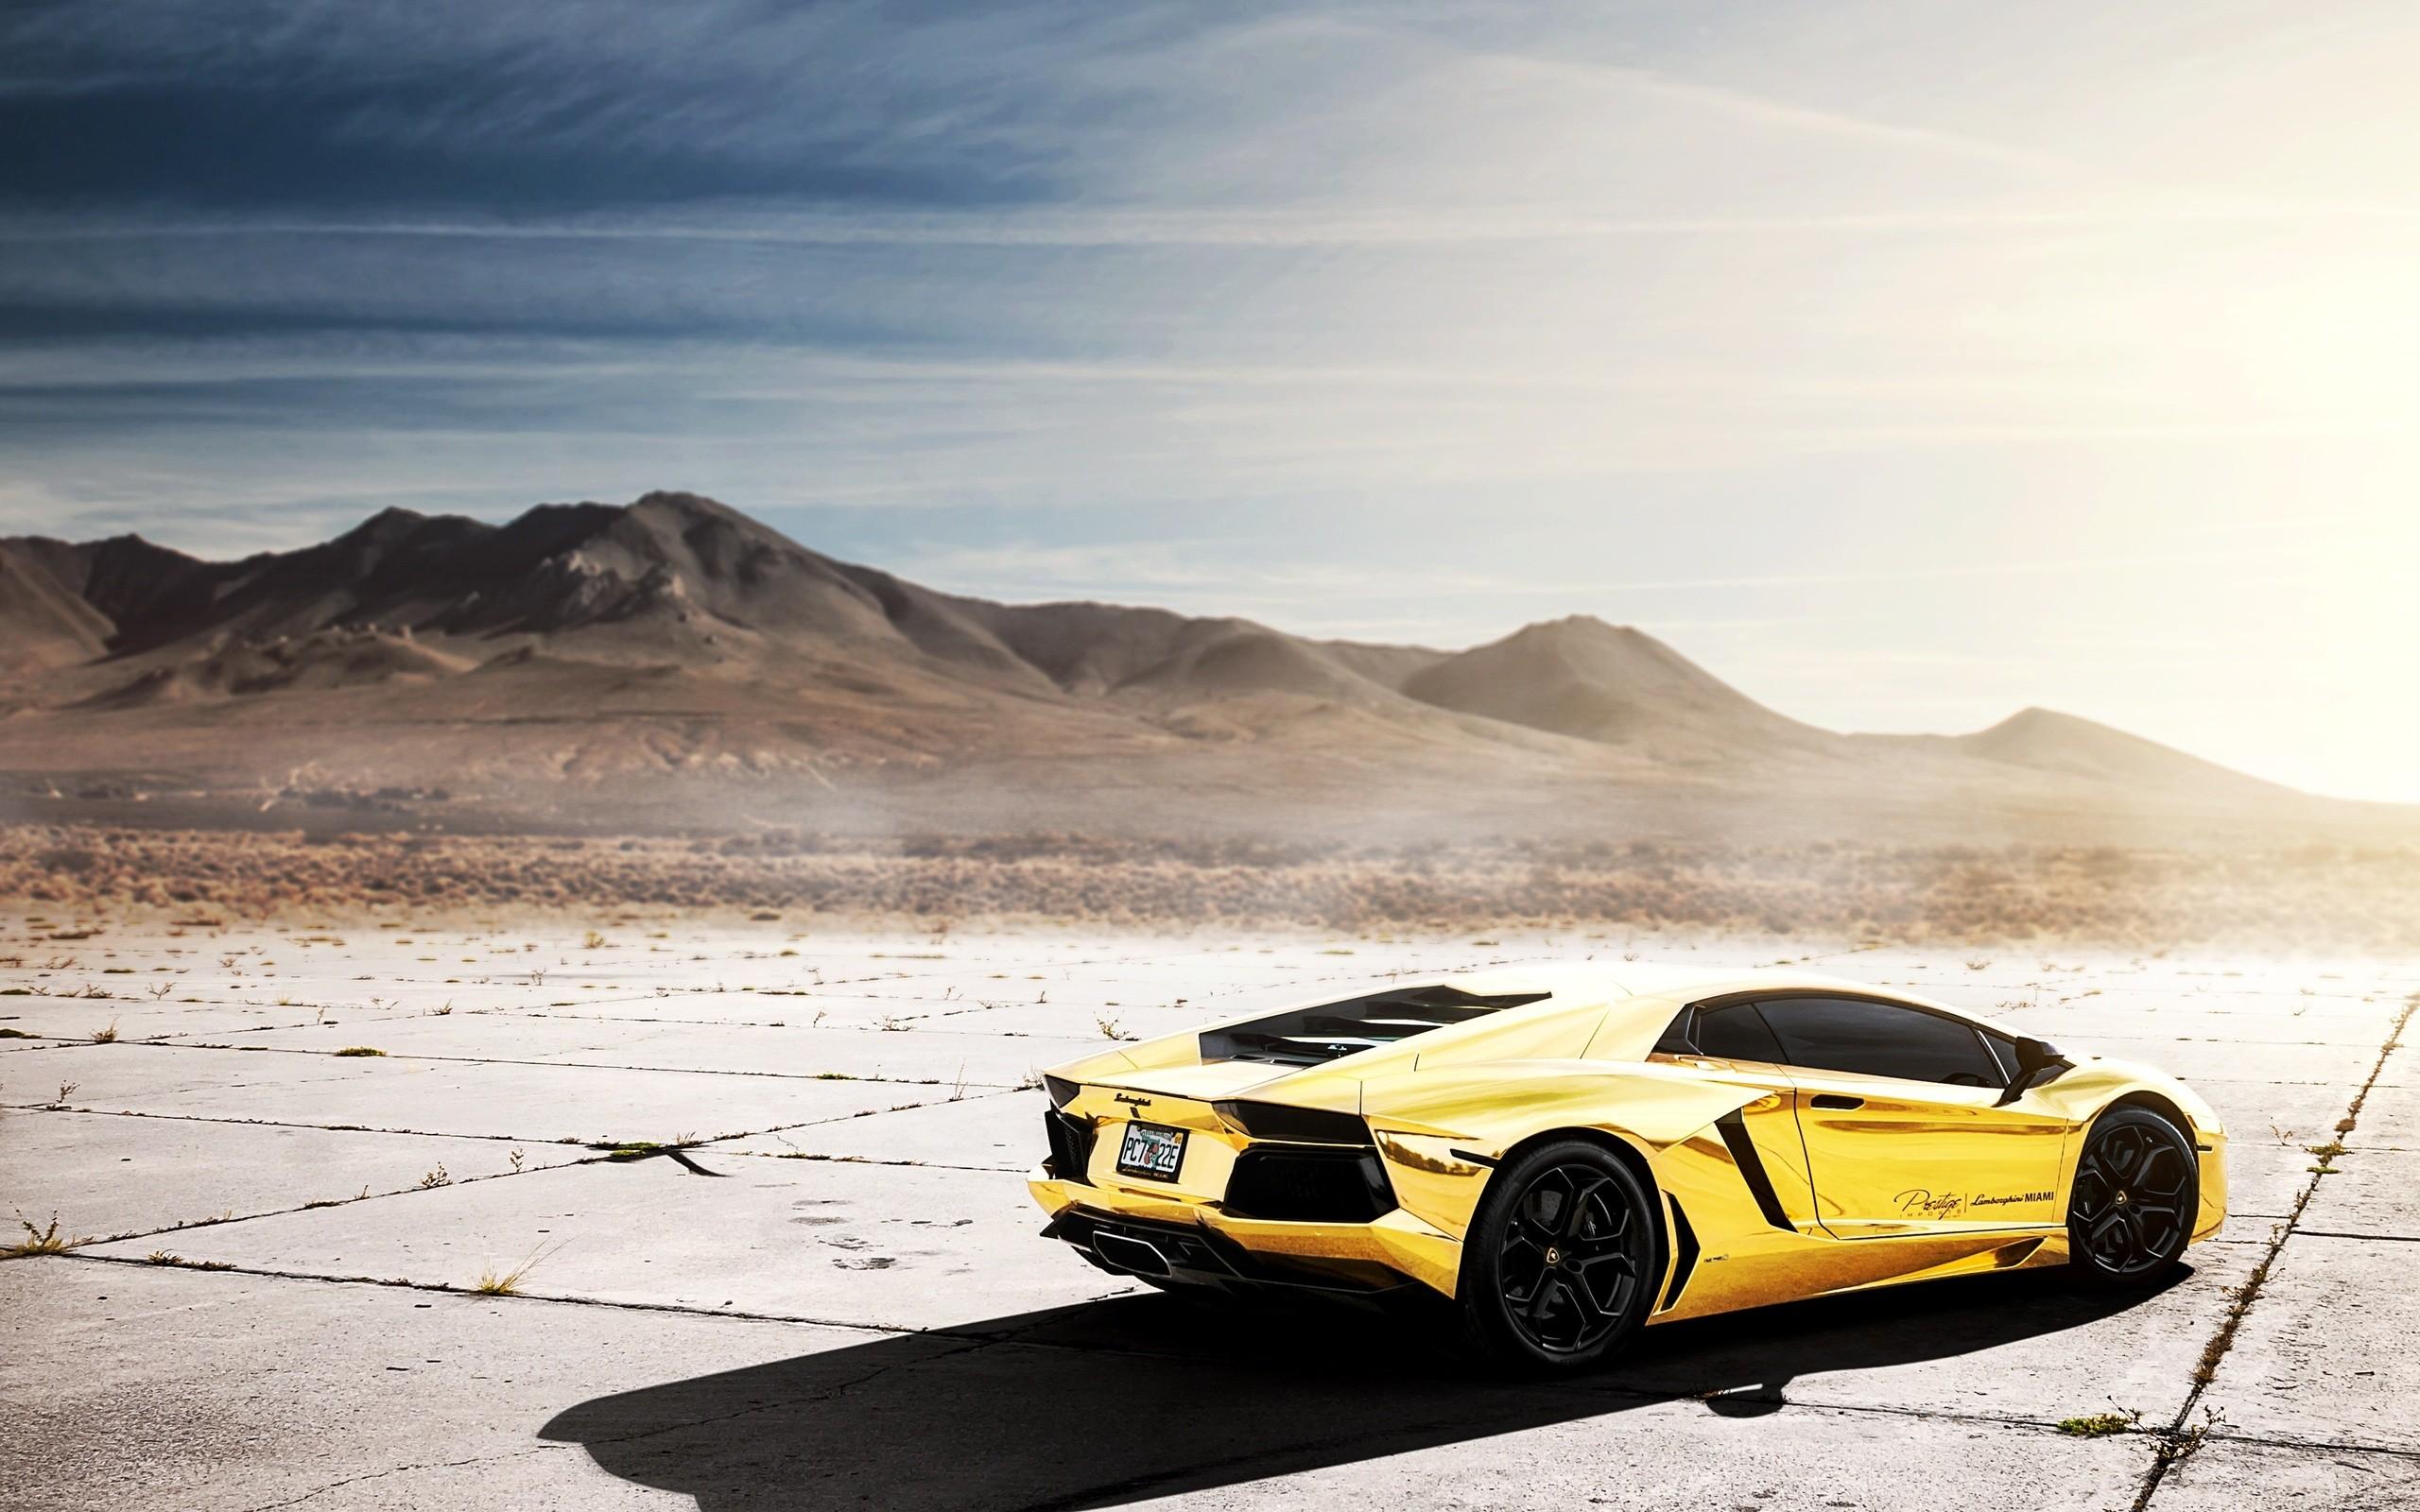 Lp700-4, Lamborghini, Lamborghini, Aventador, Chrome Gold, Project Au79,